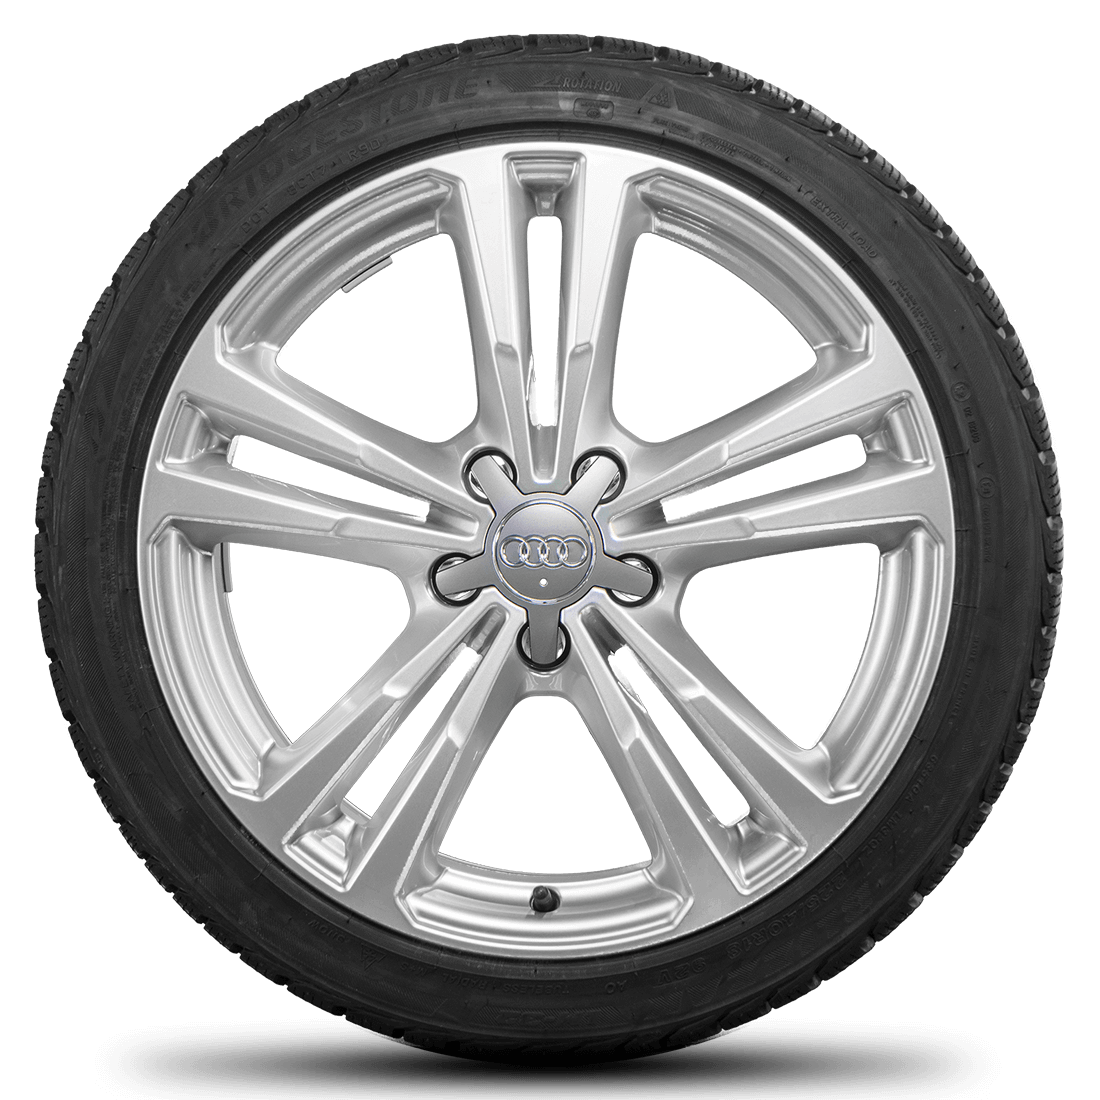 Audi A3 S3 8V 8P 18 Zoll Alufelgen Felgen Winterreifen Winterräder 8 mm S line